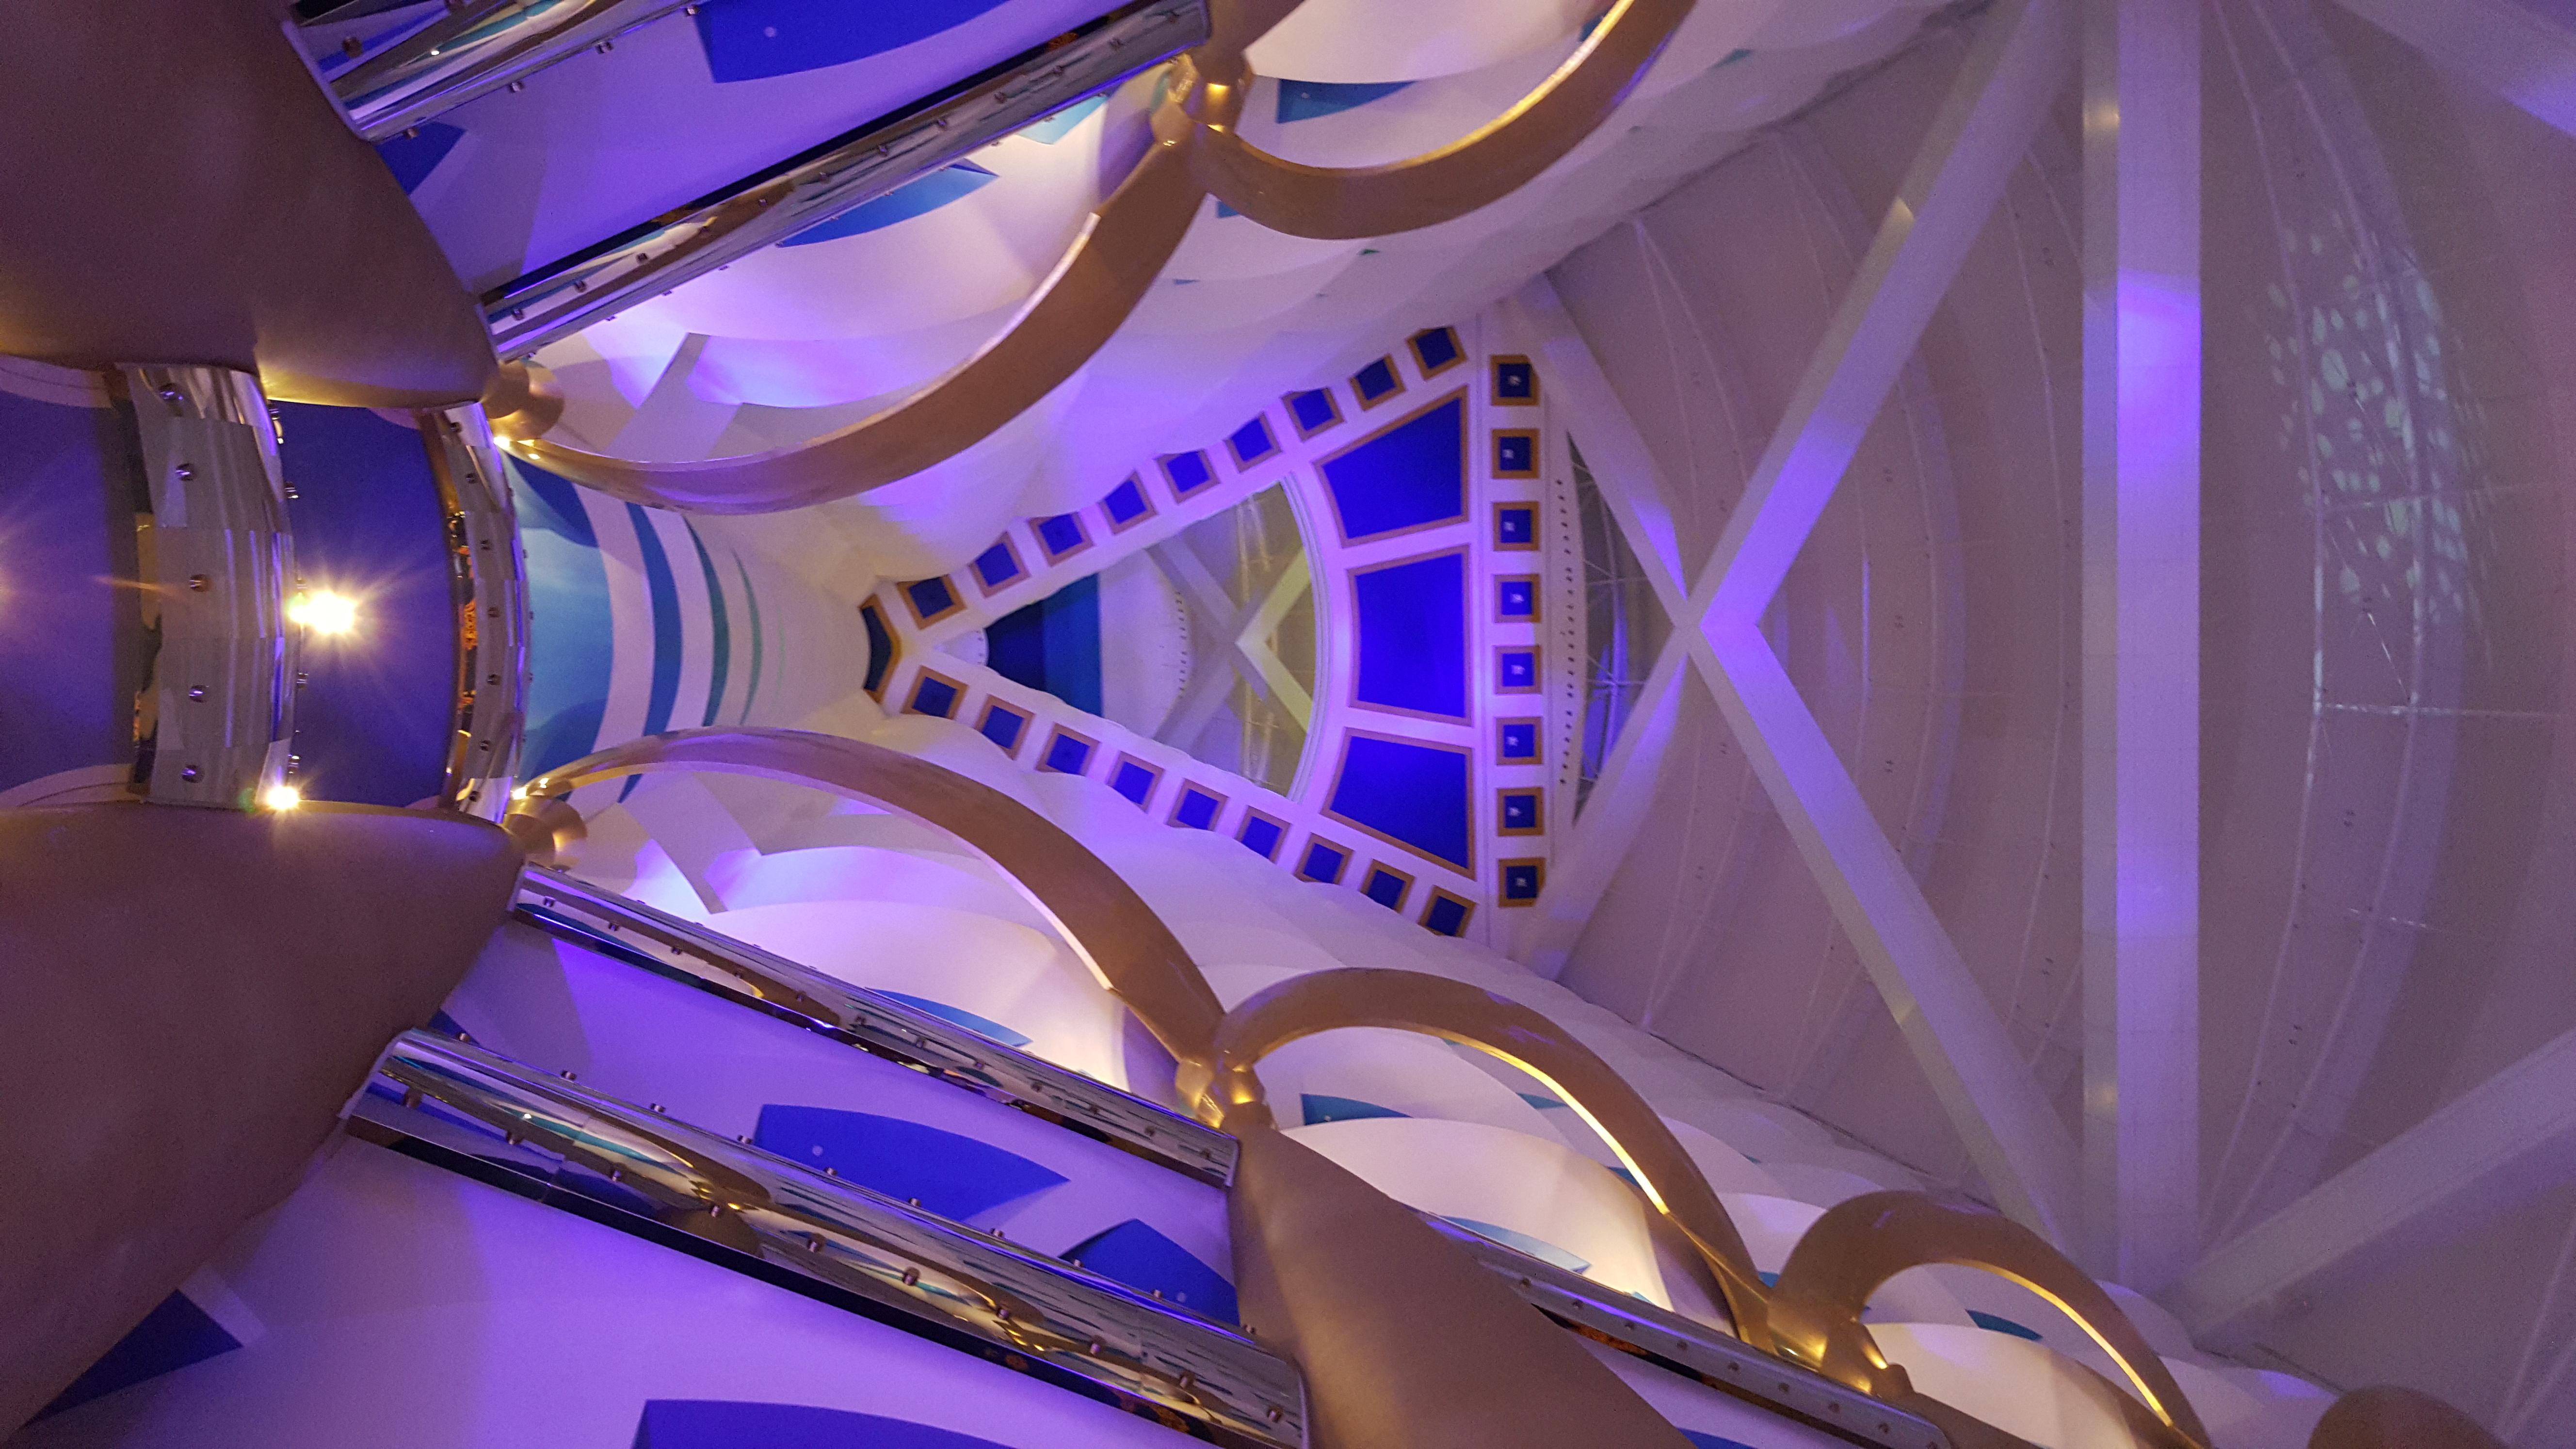 By Electroluminescent store Dubai